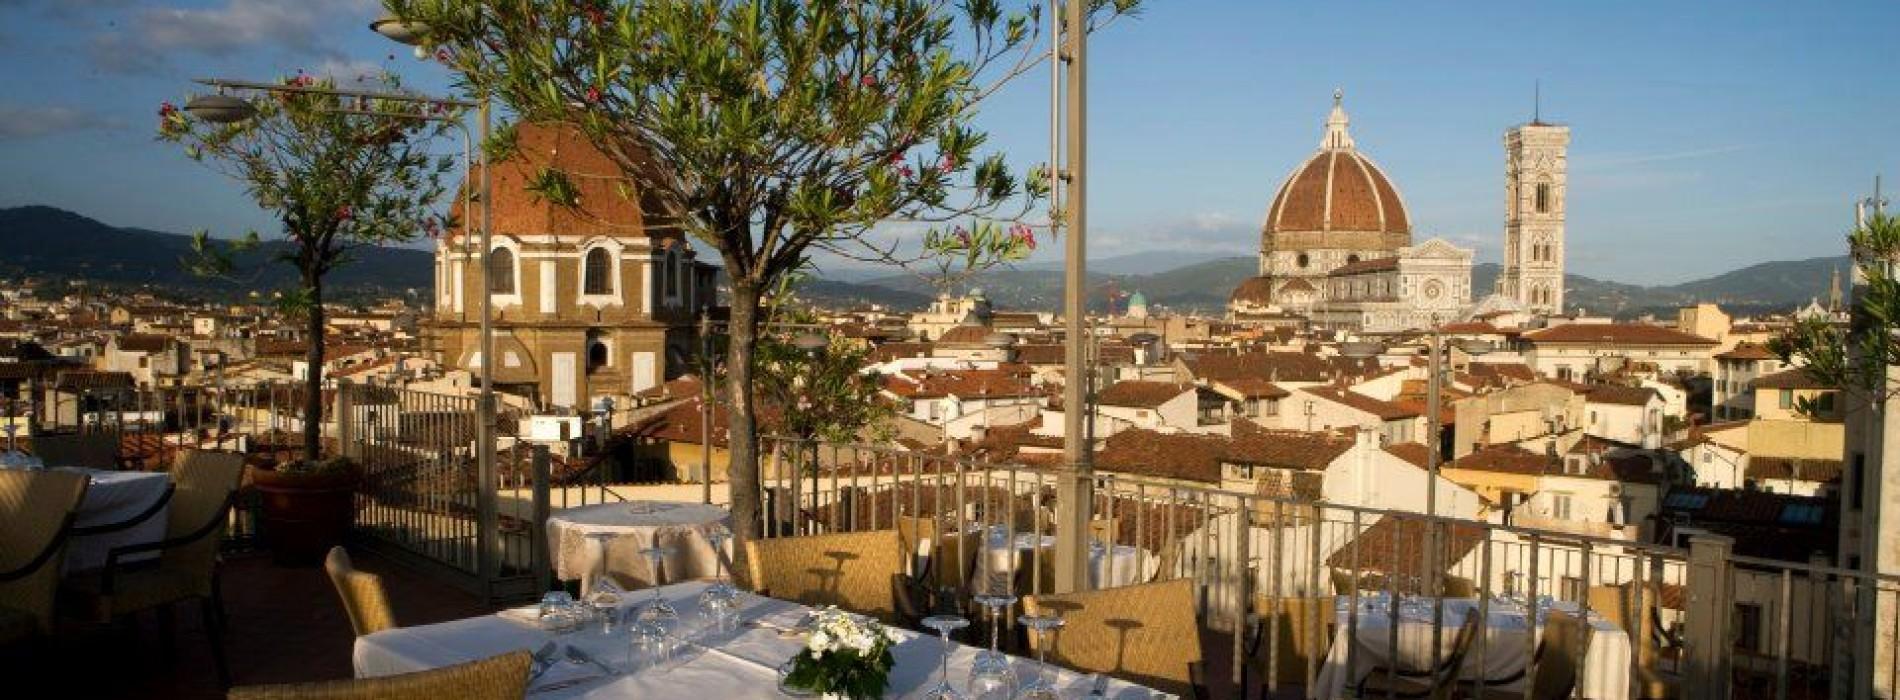 Terrazza Hotel Excelsior Firenze